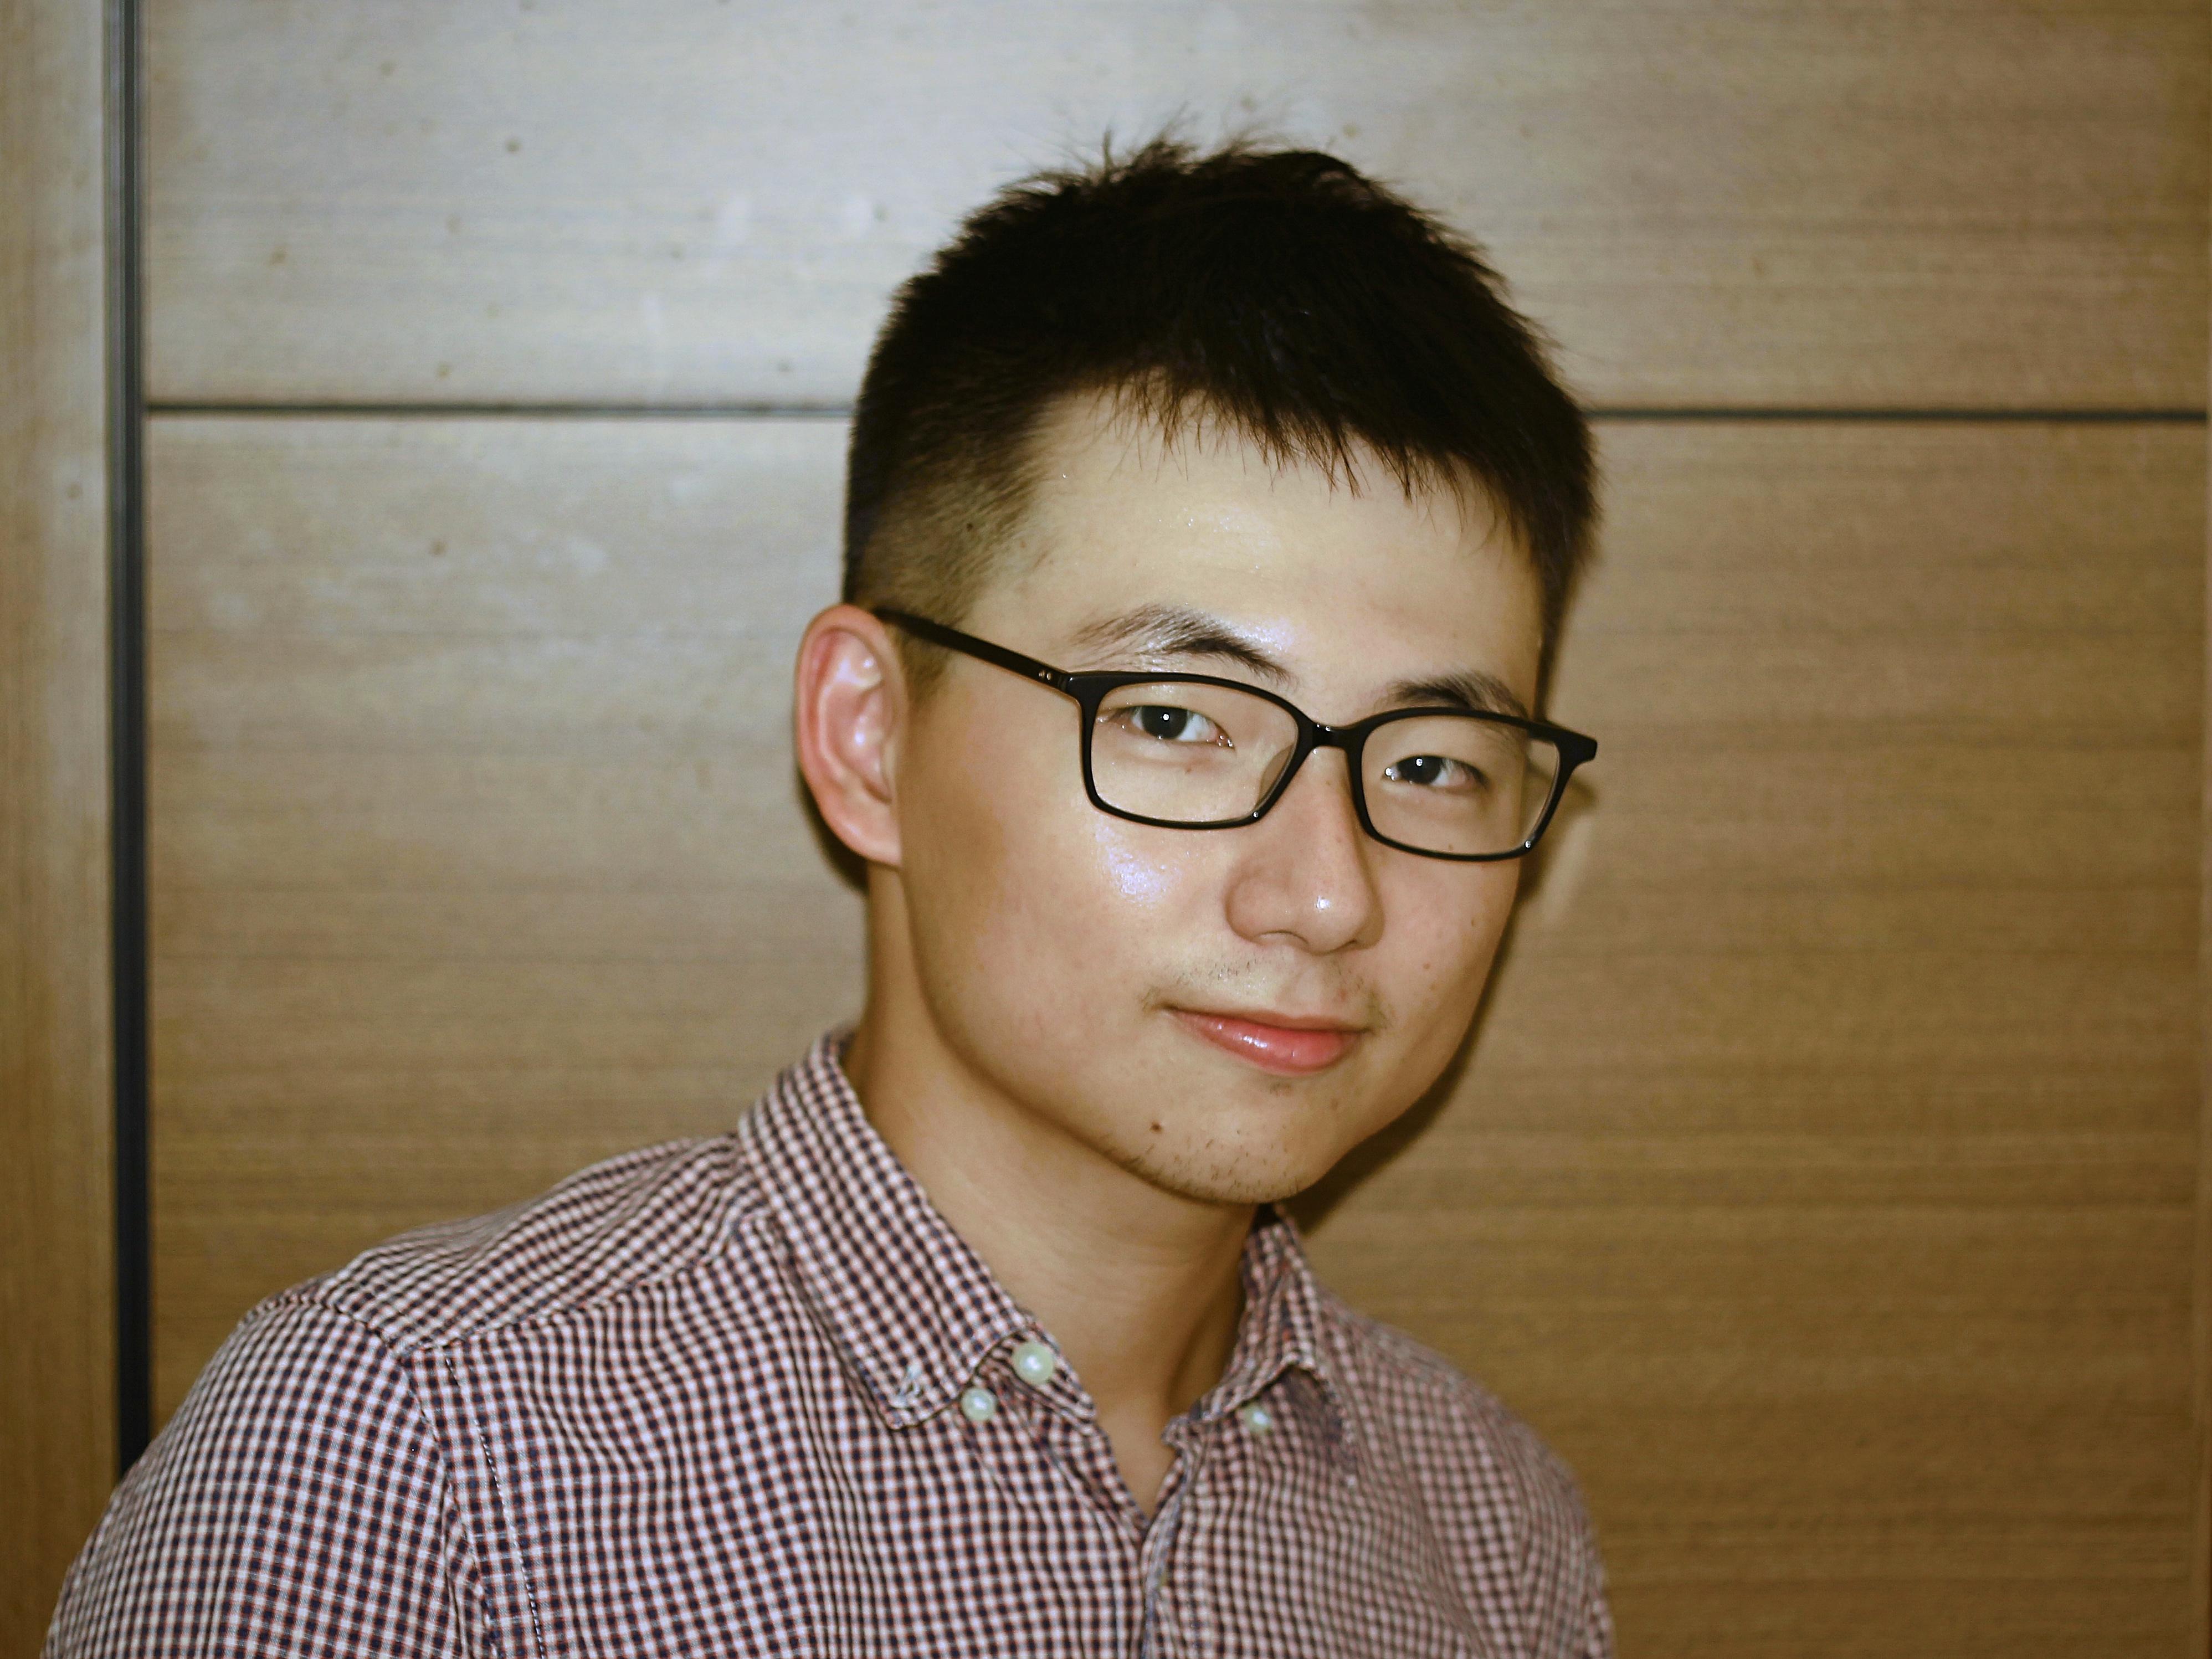 Hsiang Sheng Chen